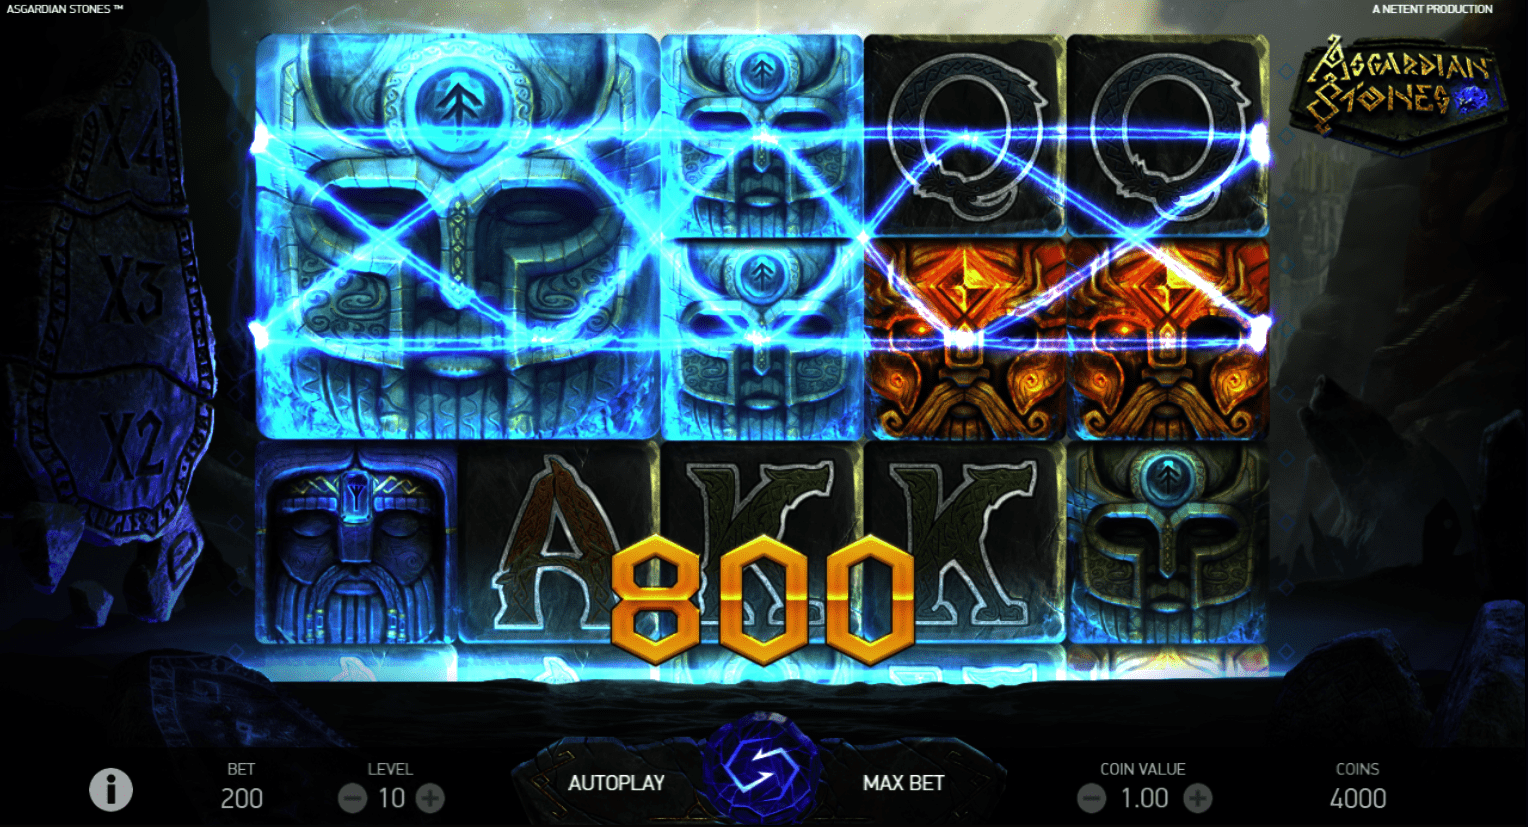 asgardian stones gameplay 2